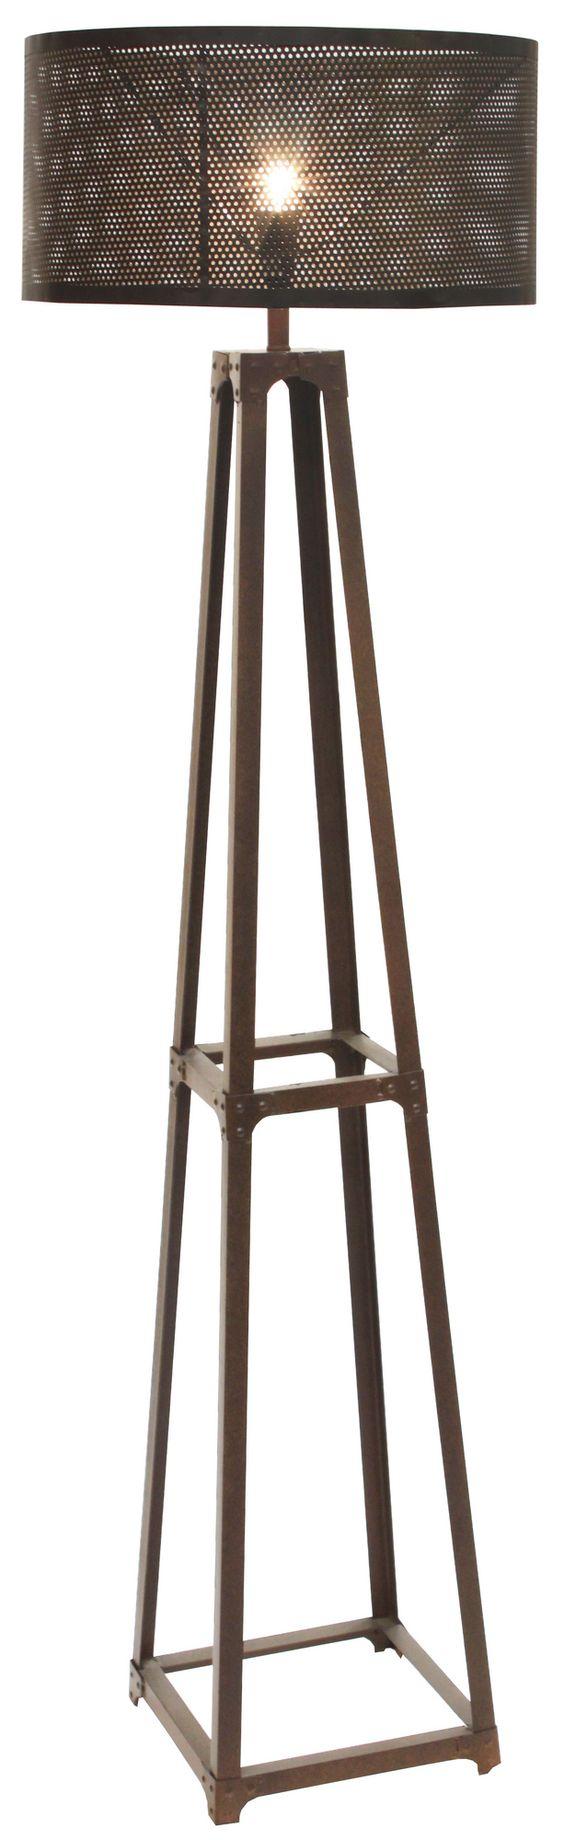 Furniture Online & Decorating Accessories | Industrie Metal Floor Lamp | Interiors Online Furniture $260.00